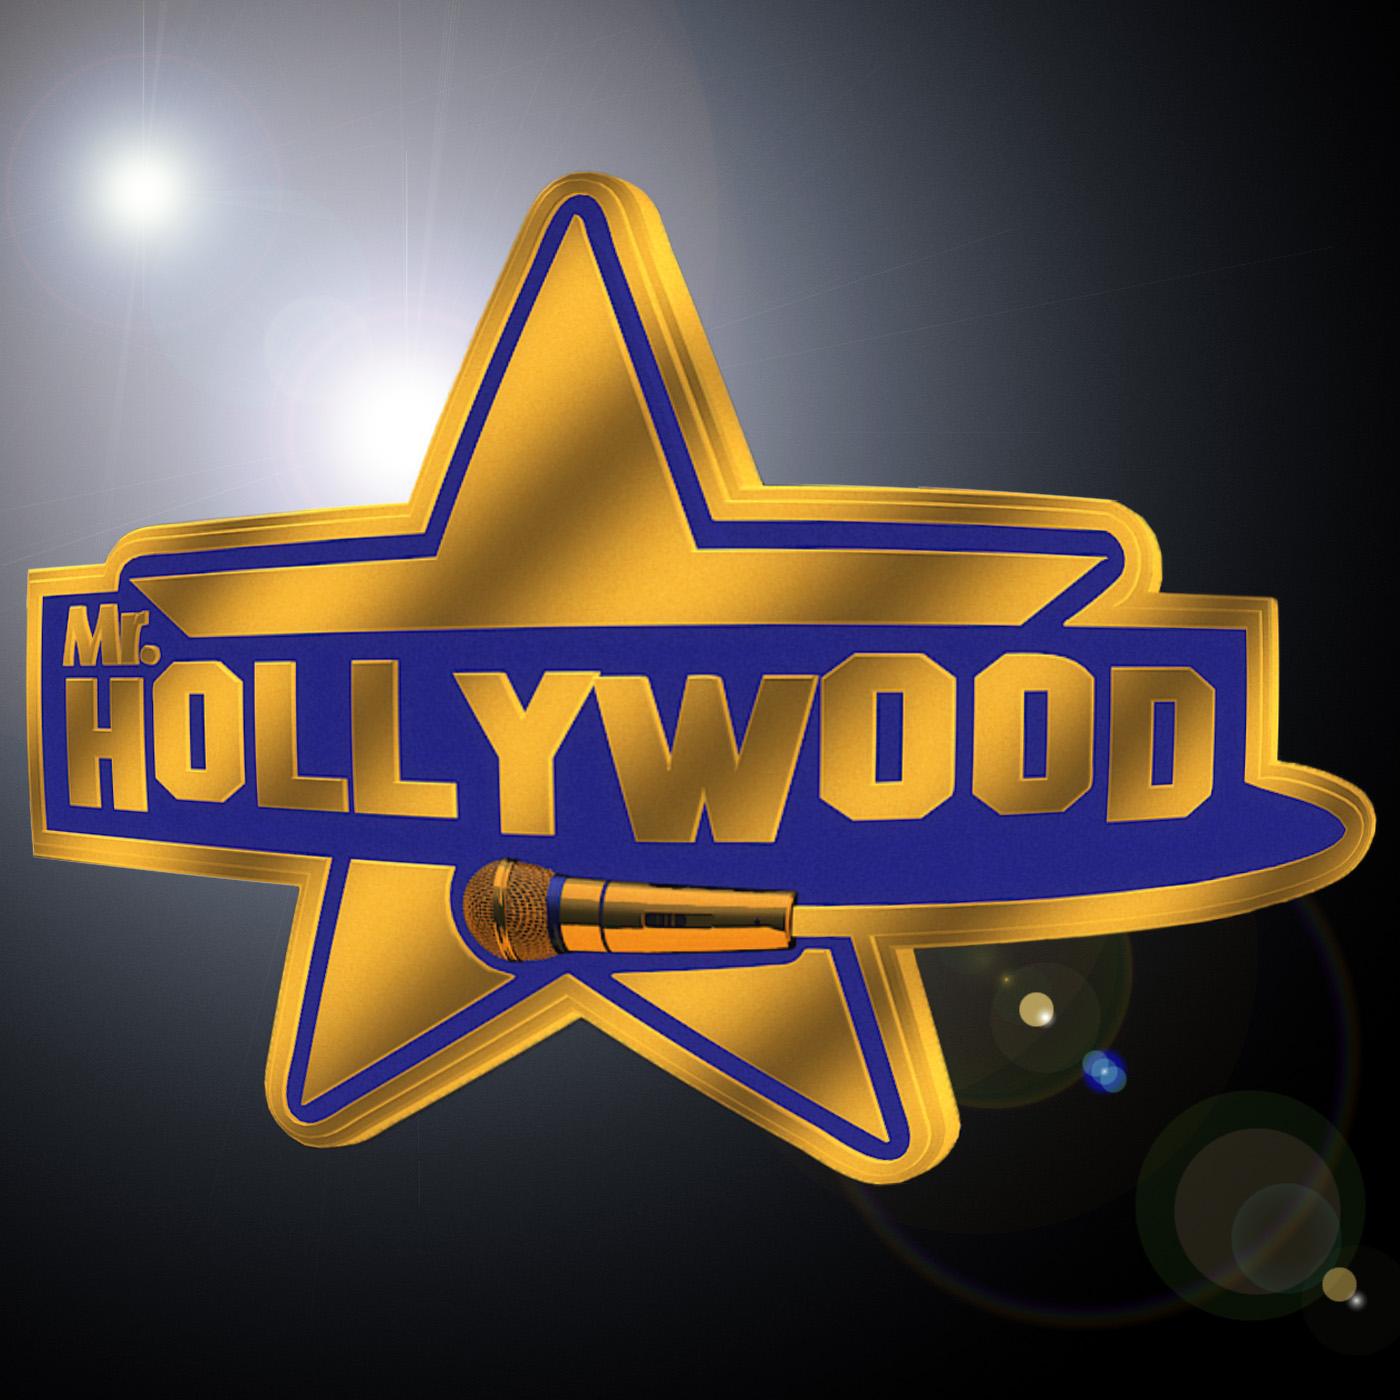 Mr. Hollywood show art